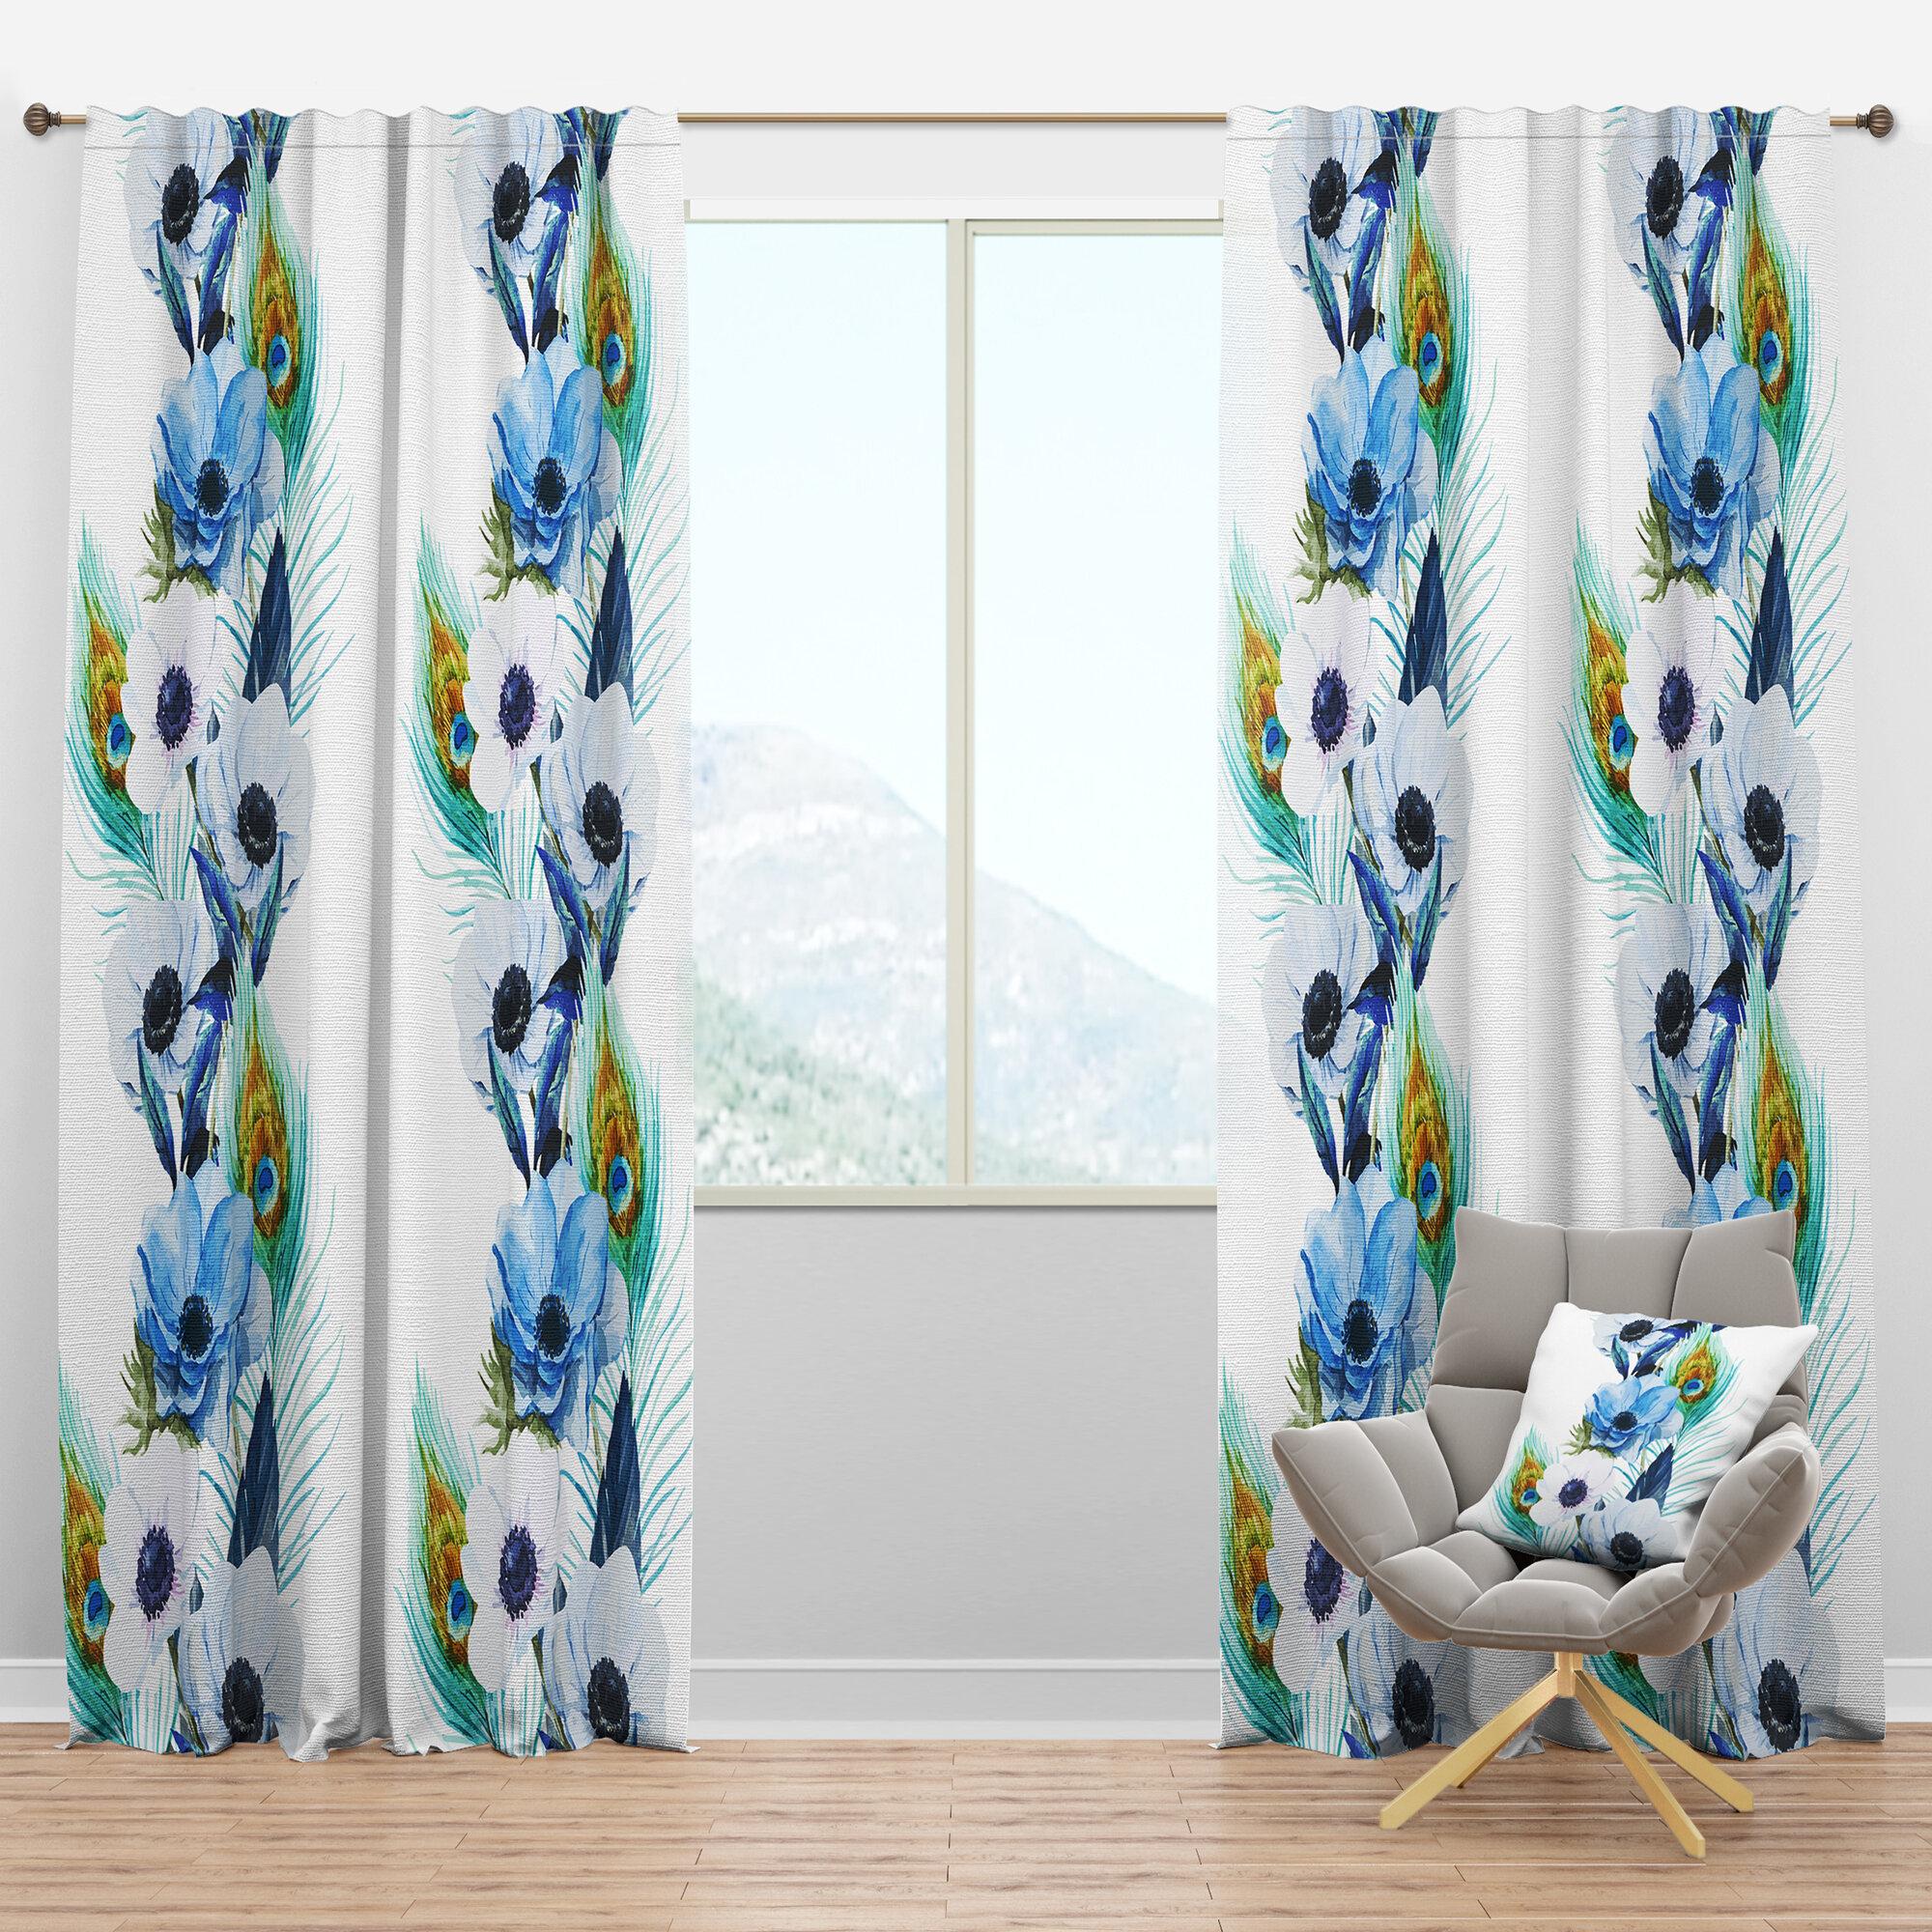 Designart Handpainted Anemones And Peacock Feathers Floral Semi Sheer Thermal Rod Pocket Curtain Panels Wayfair